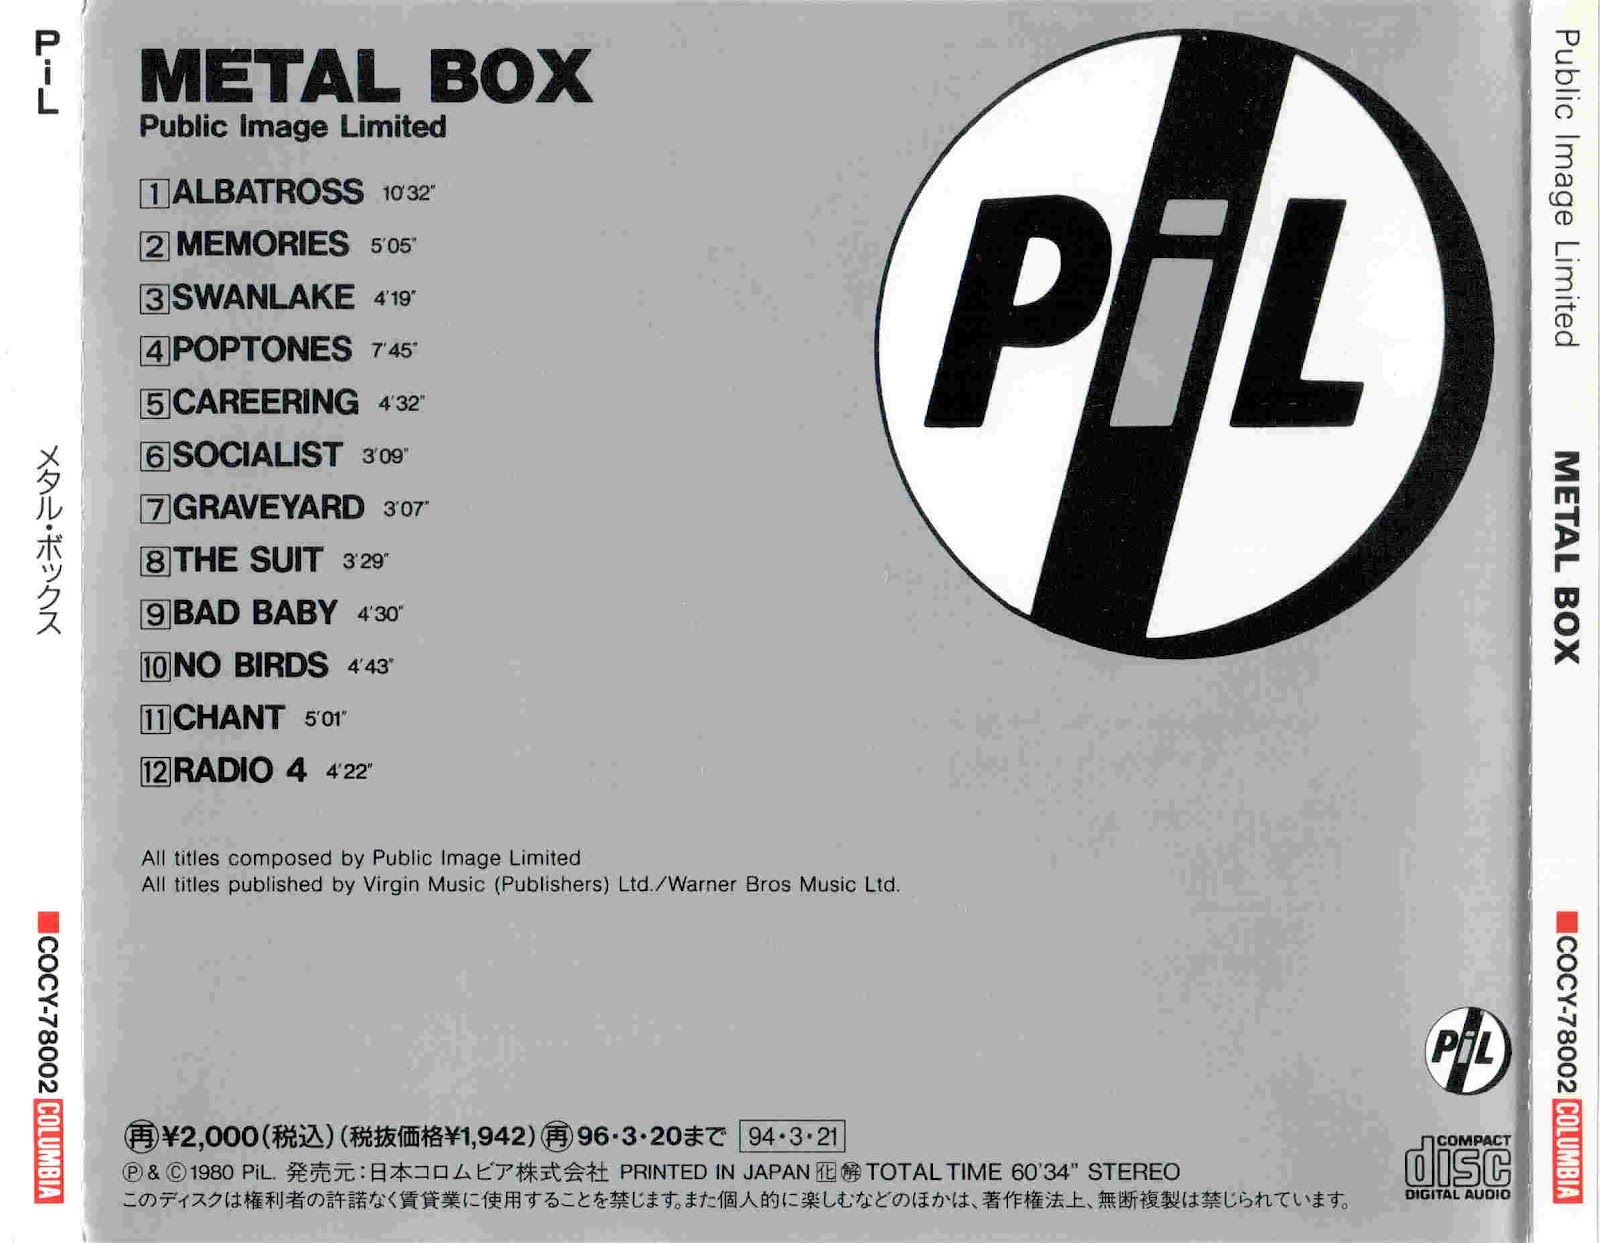 PiL Second Edition